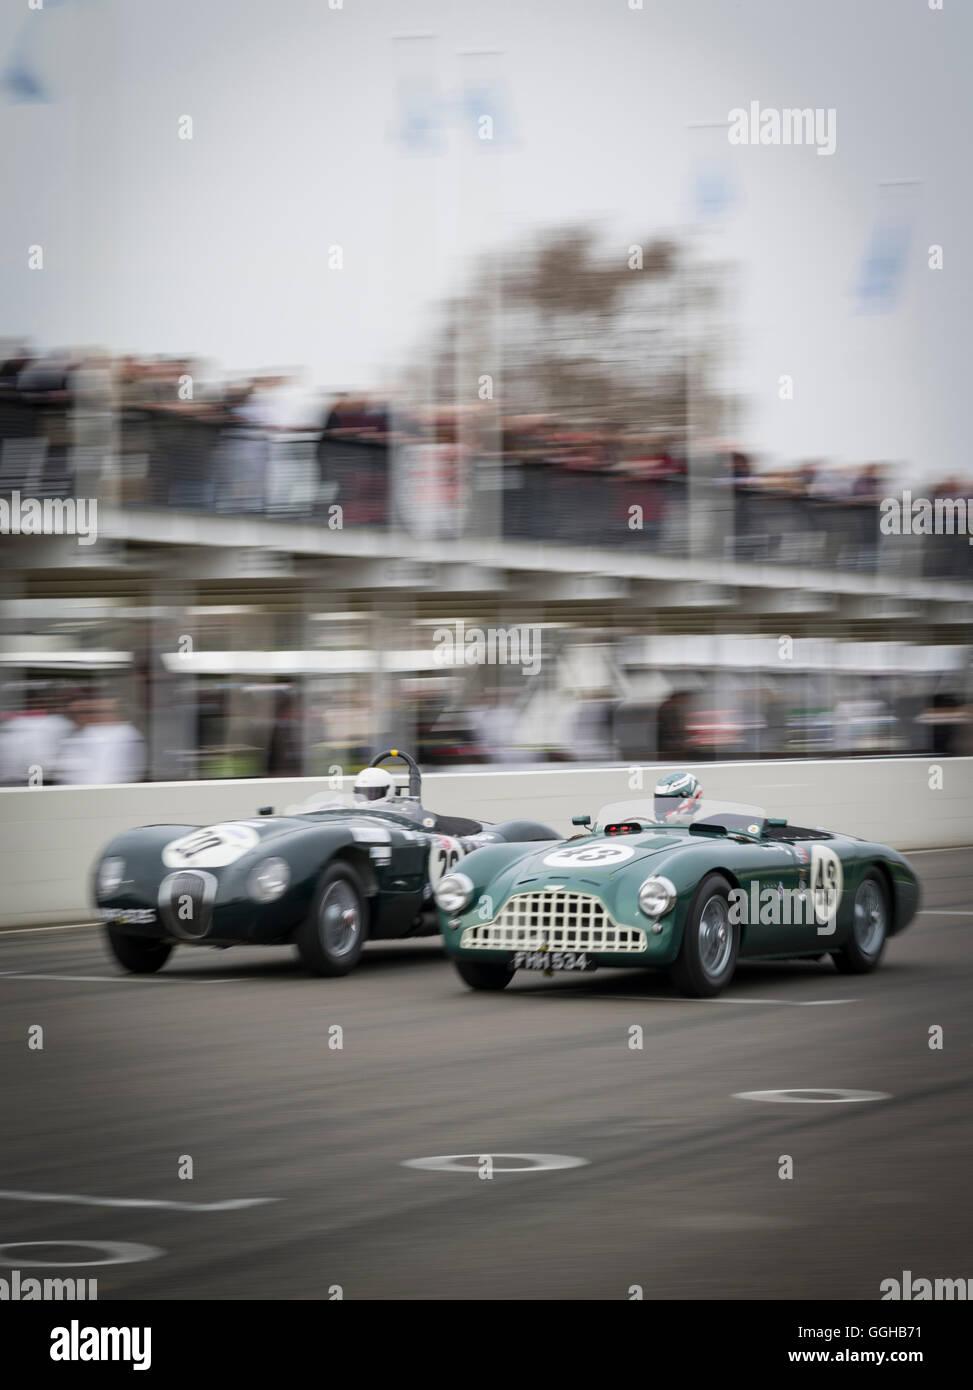 Jaguar C-Type (L) and Aston Martin DB3, Peter Collins Trophy, 72nd Members Meeting, racing, car racing, classic - Stock Image